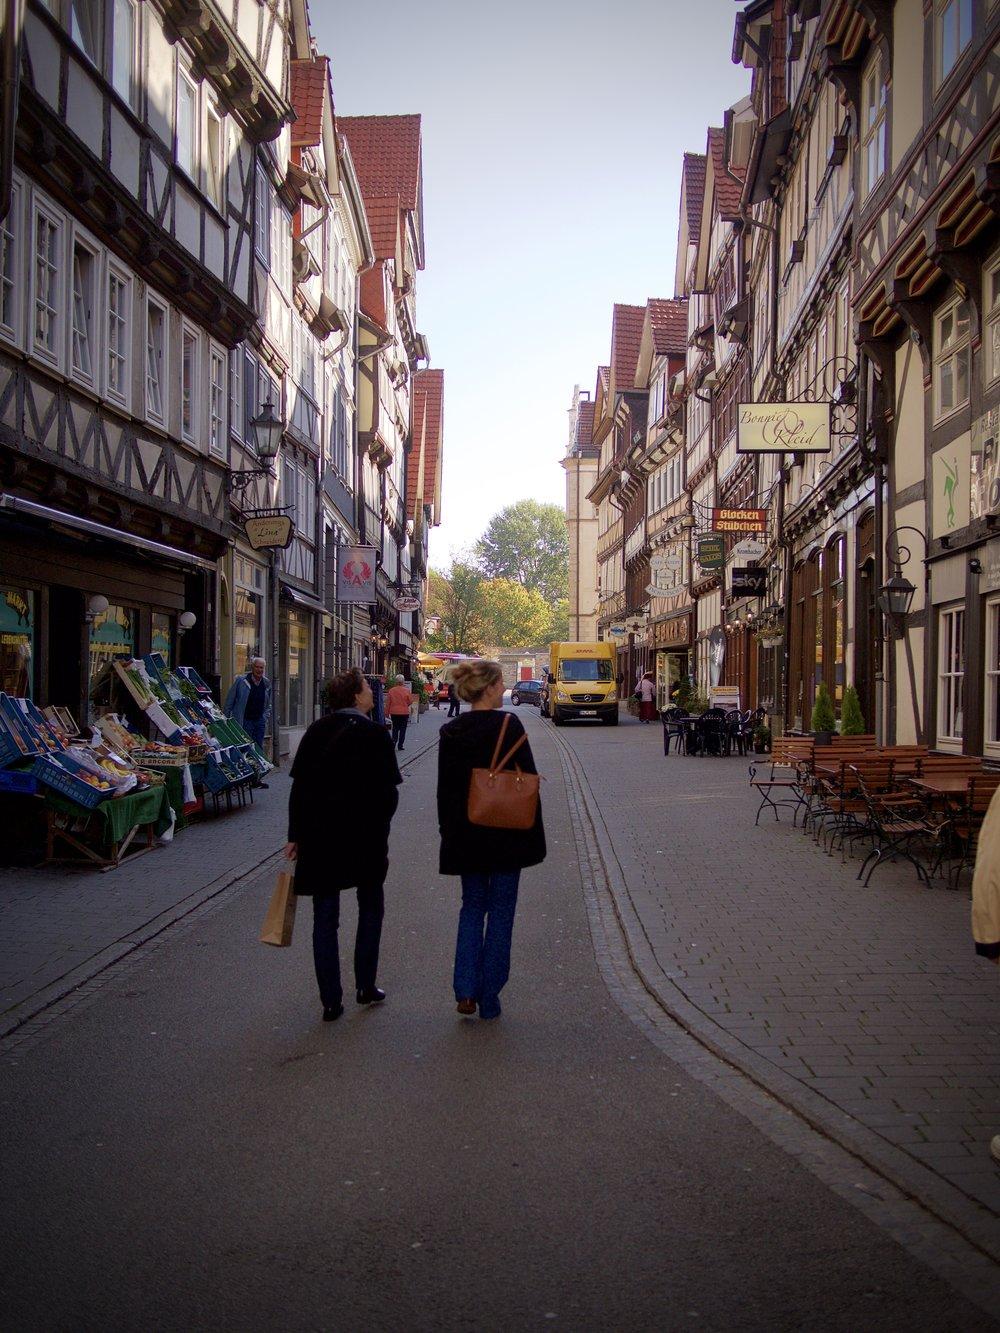 Wunderschöner Altstadt-Flair in Hann Münden